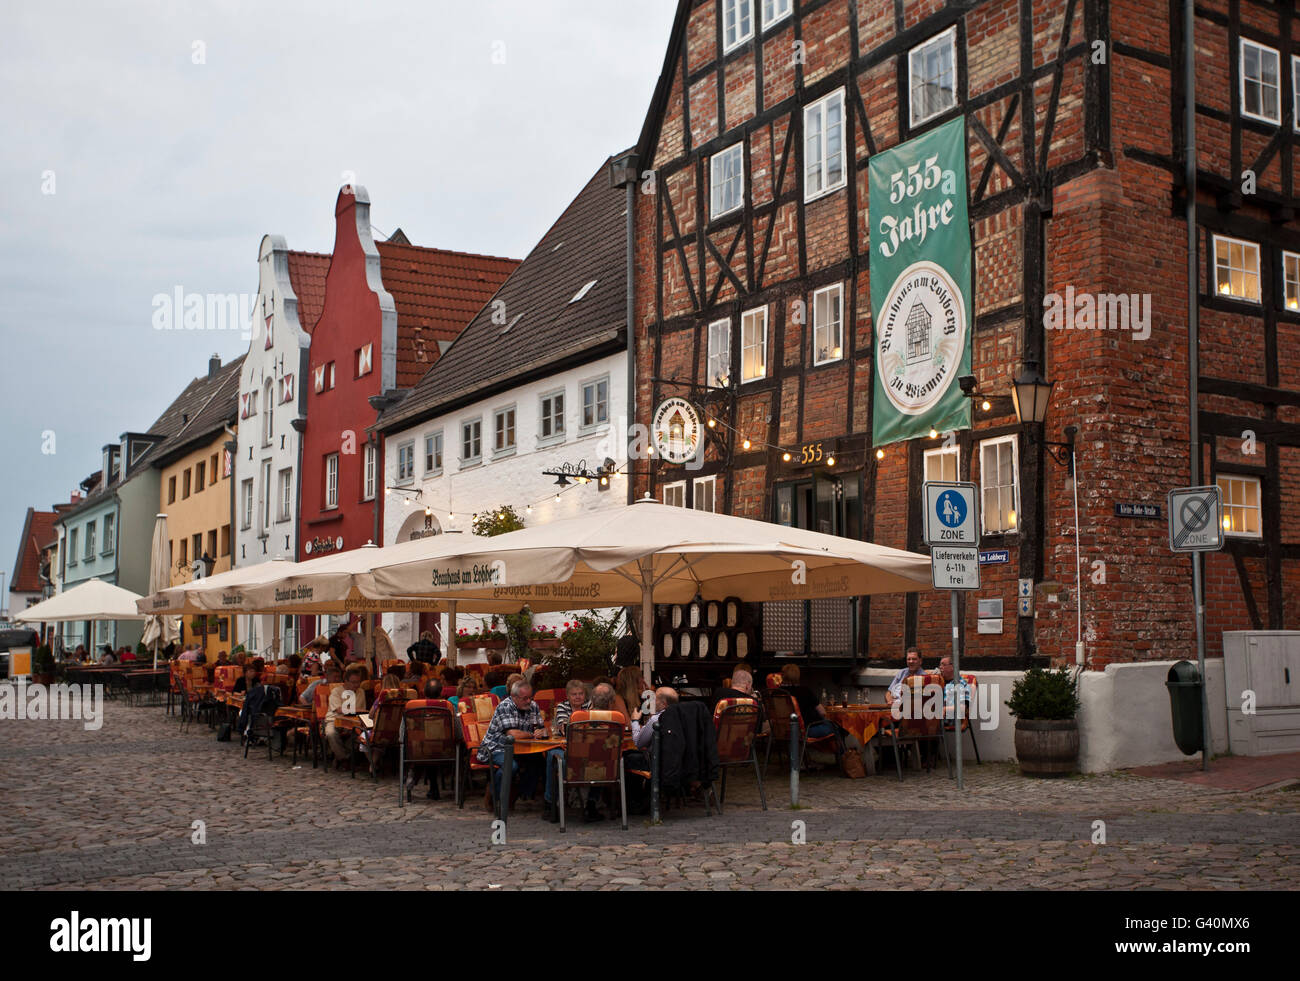 Brewhouse am Lohberg, restaurant, Wismar, Mecklenburg-Western Pomerania - Stock Image